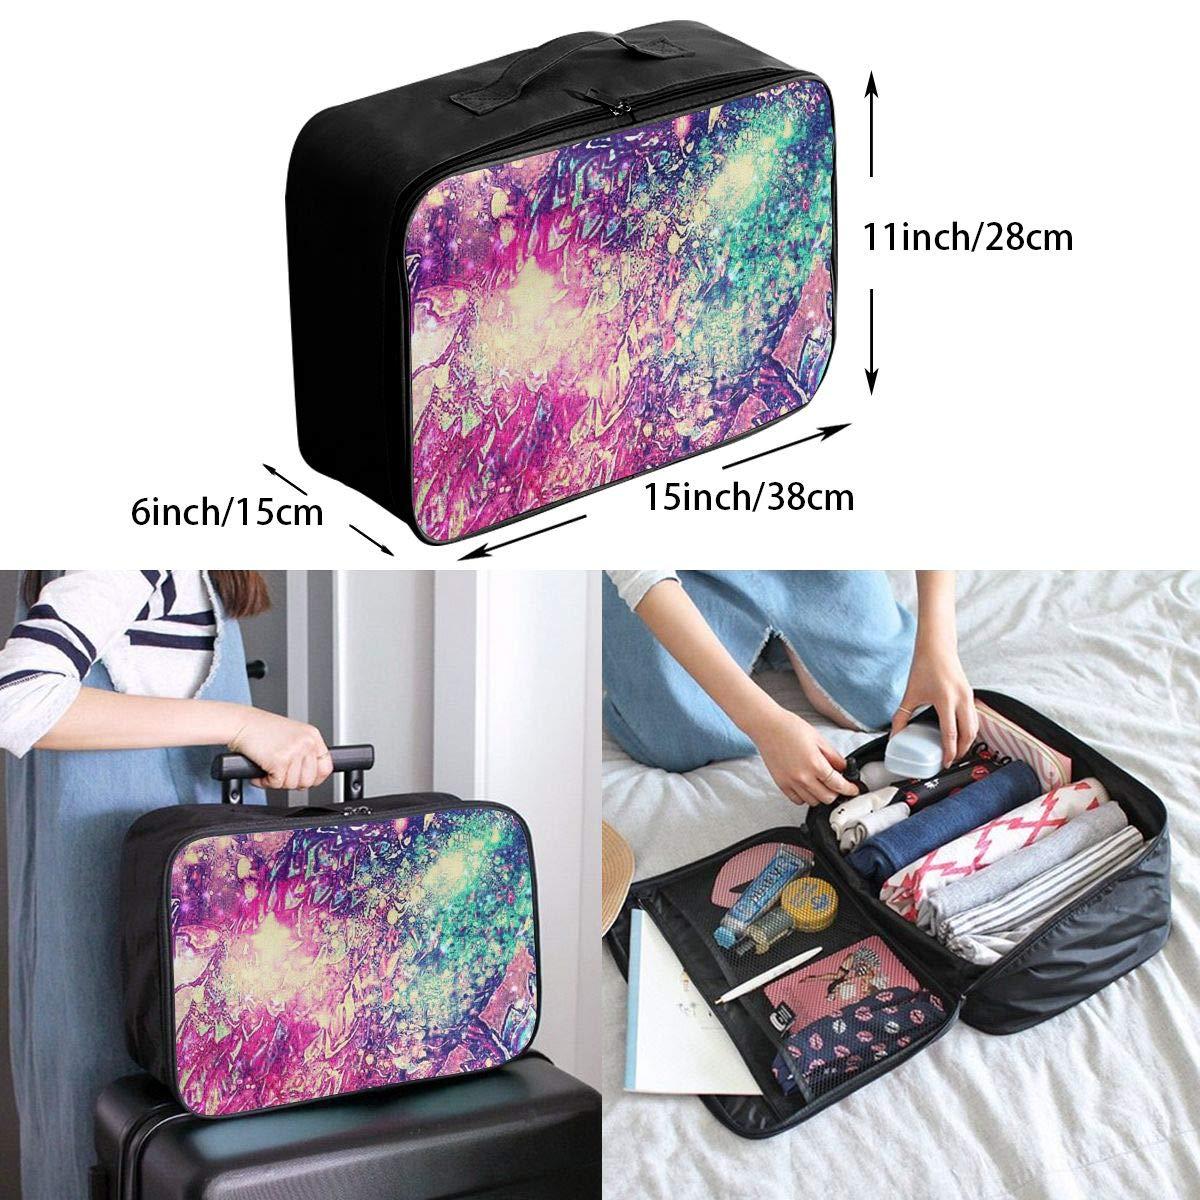 Travel Luggage Duffle Bag Lightweight Portable Handbag Galaxy Owl Pattern Large Capacity Waterproof Foldable Storage Tote